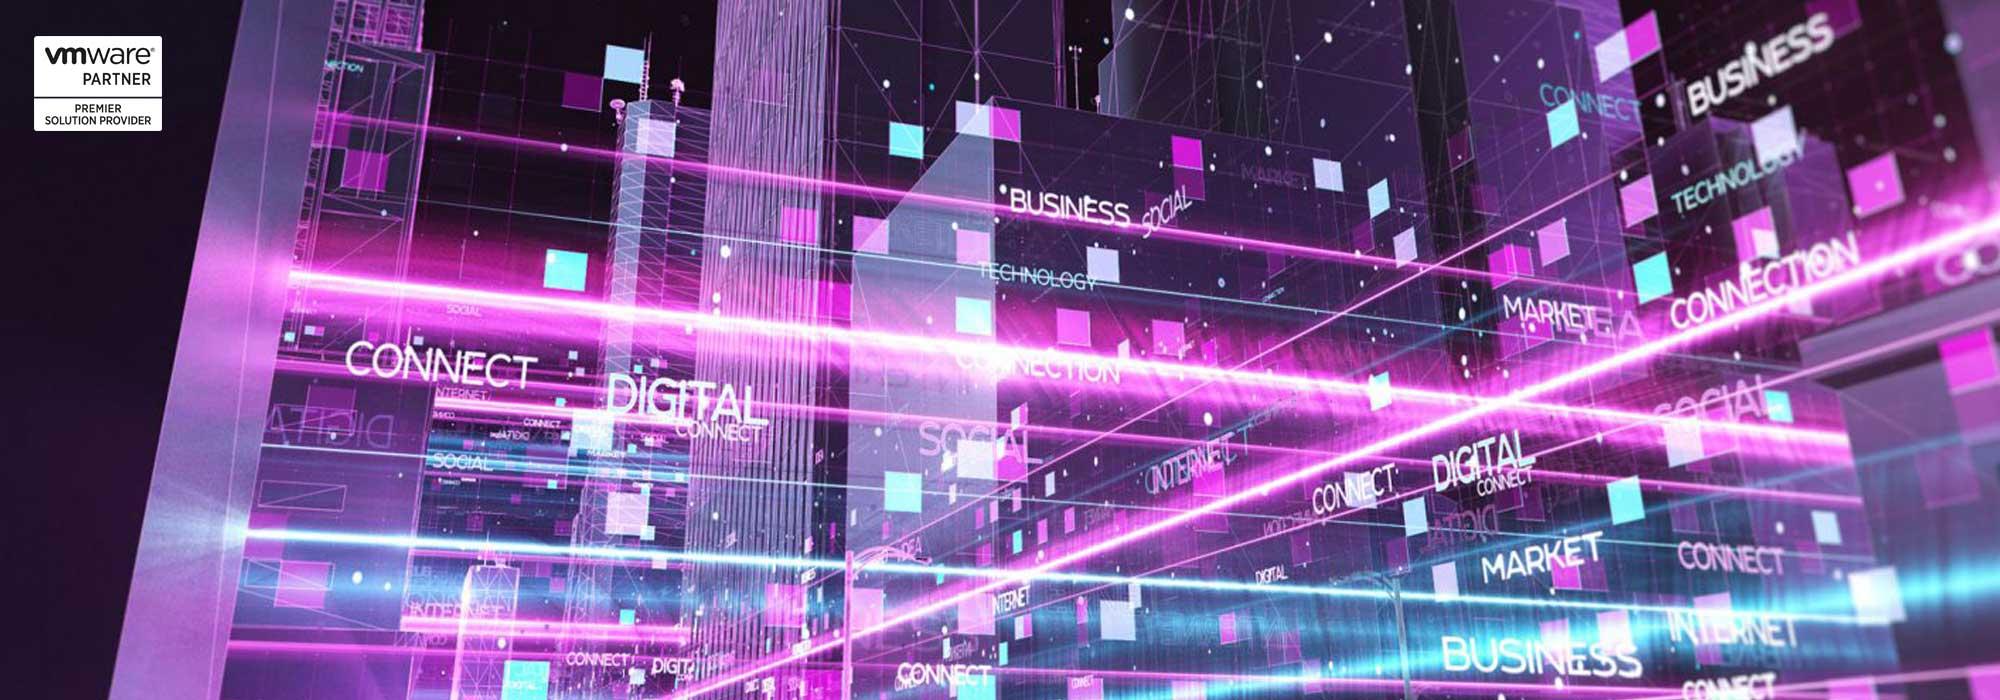 The Digital Foundation